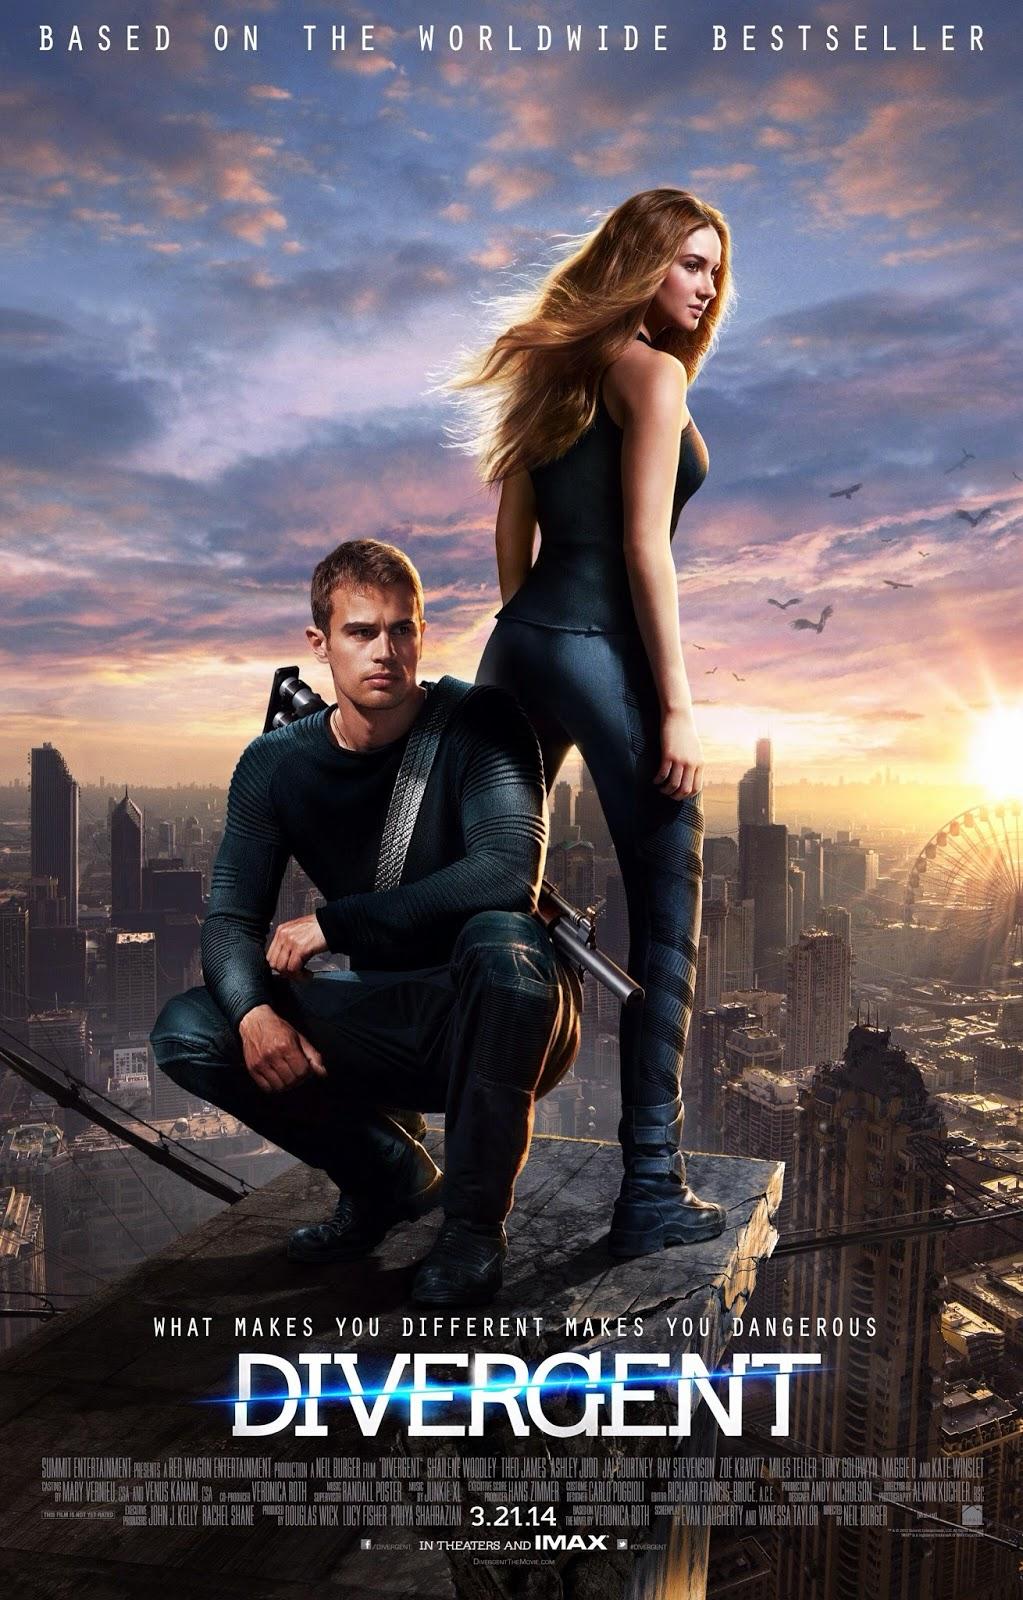 Divergent (2014) 350MB BRRip 480P English ESubs